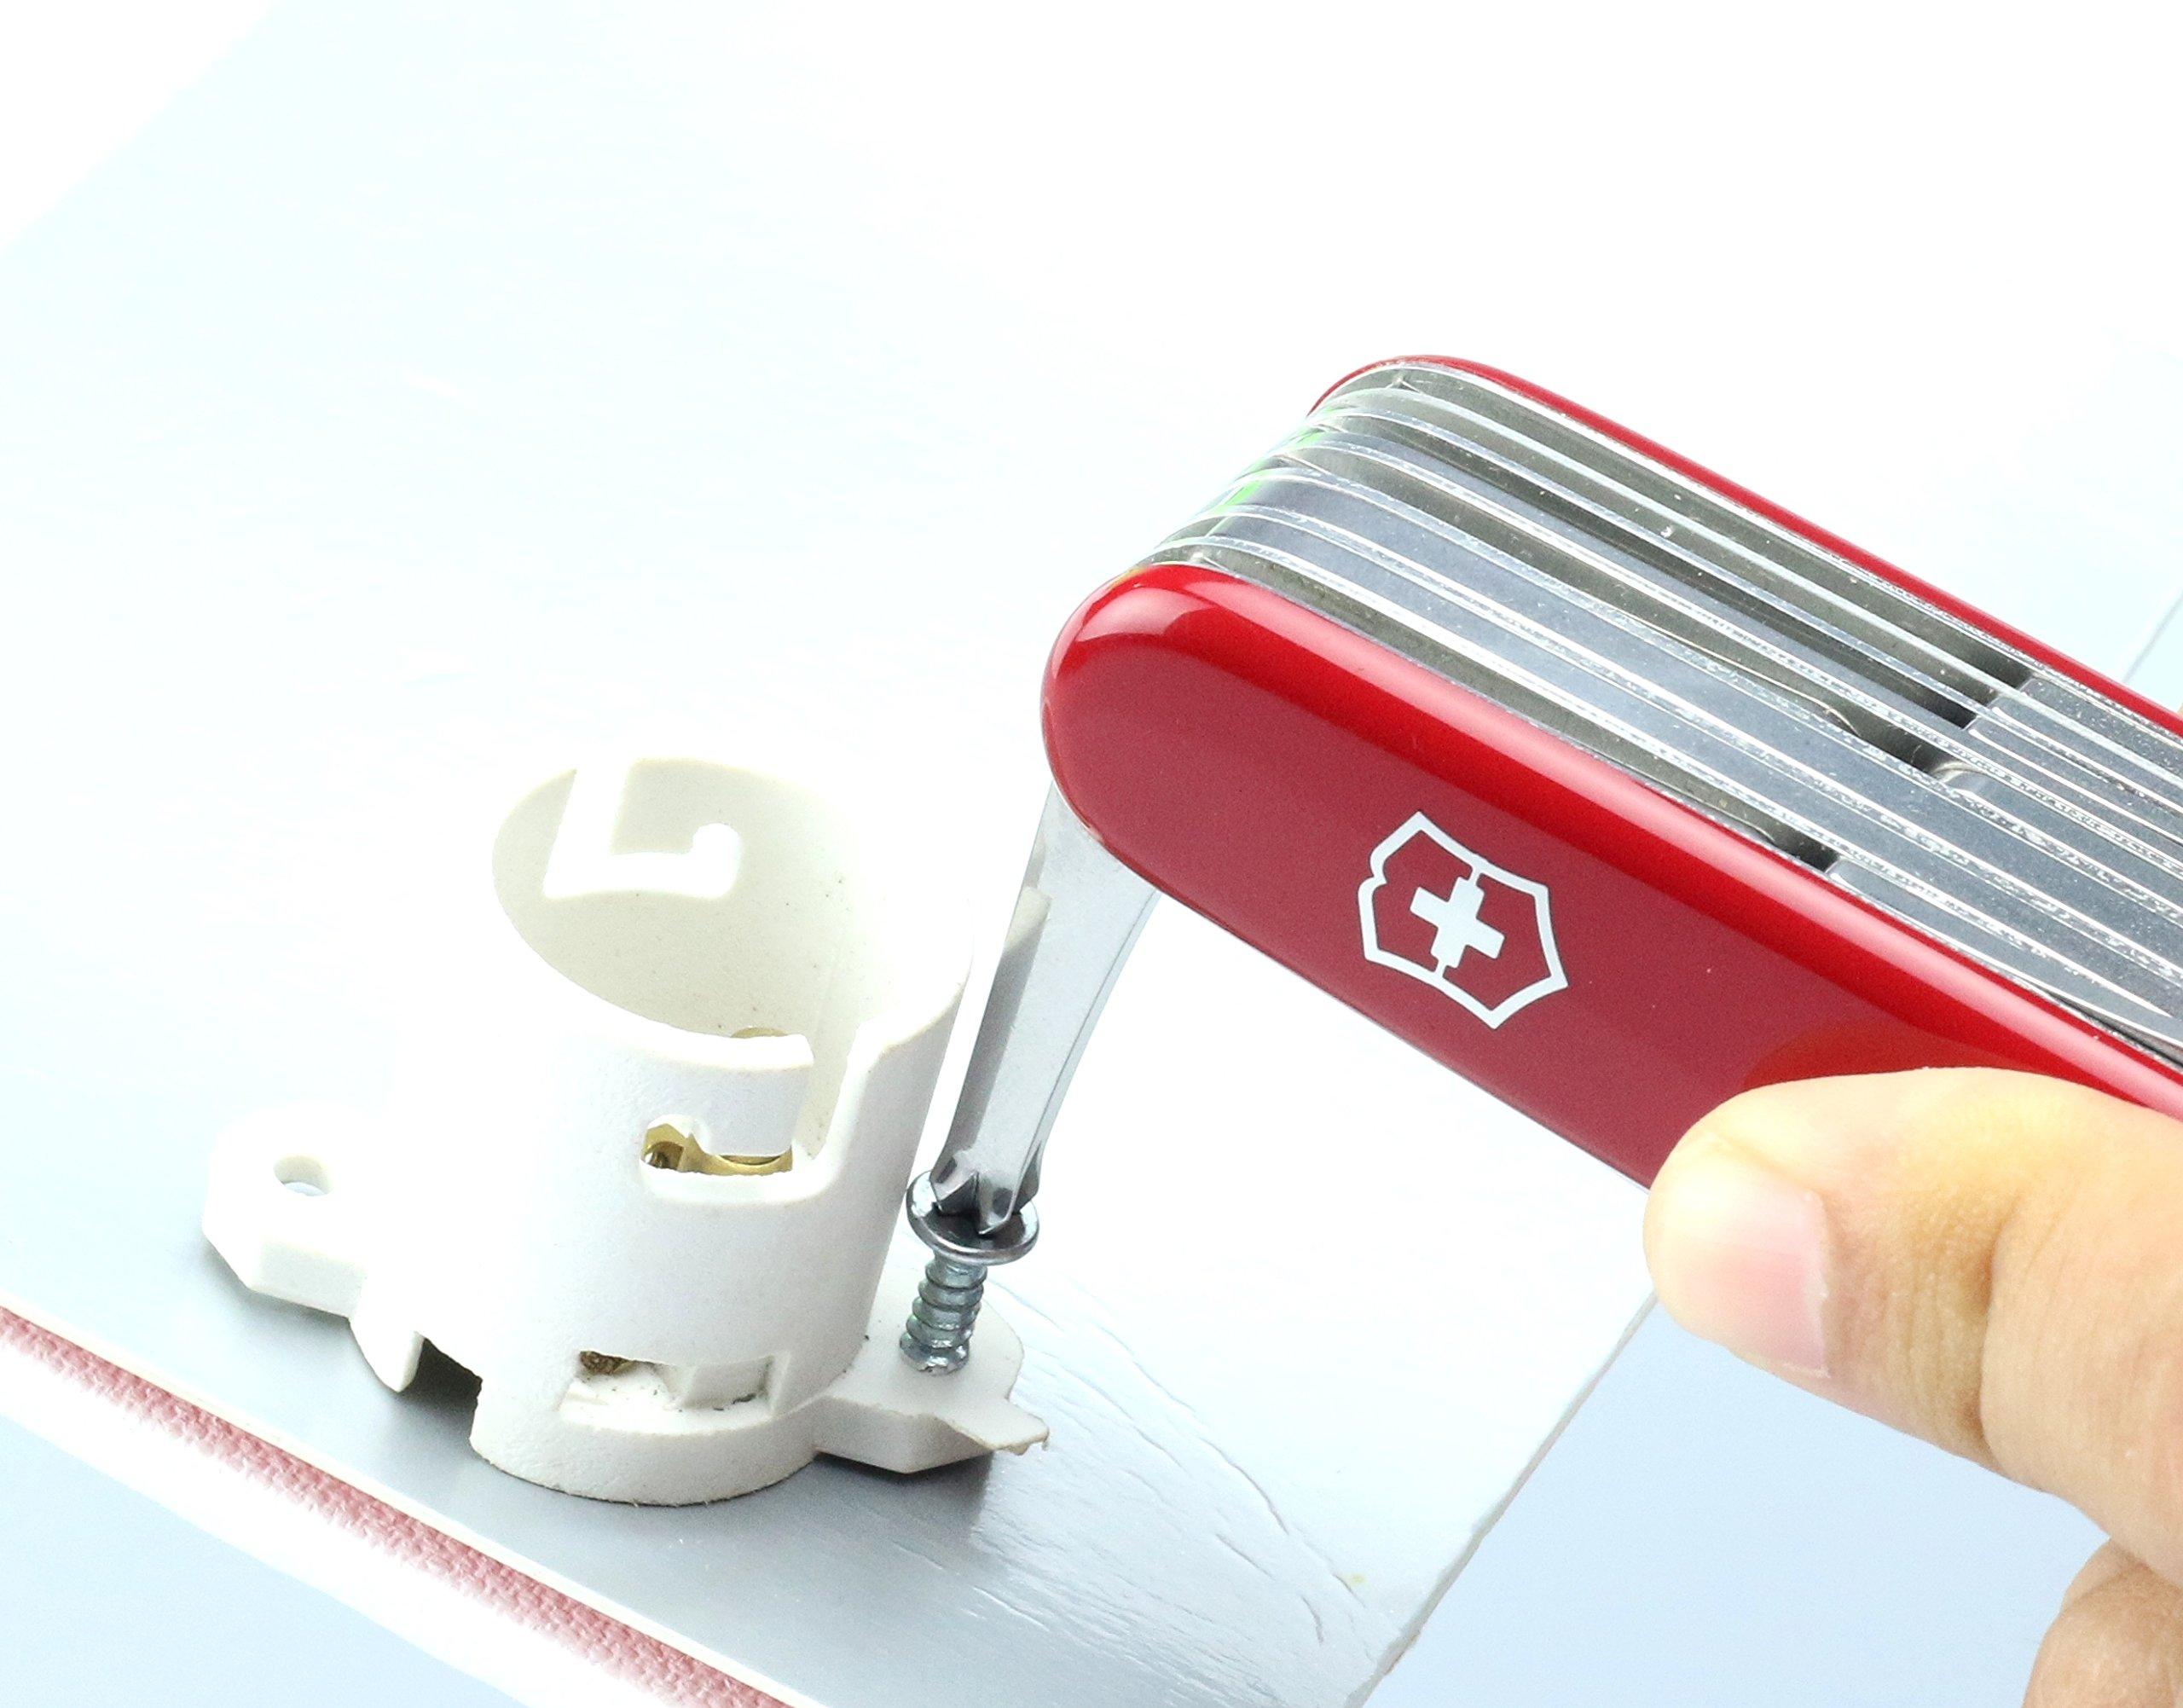 Victorinox Swiss Champ Swiss Army Pocket Knife, Medium, Multi Tool, 33 Functions, Blade, Scissors, Red 36